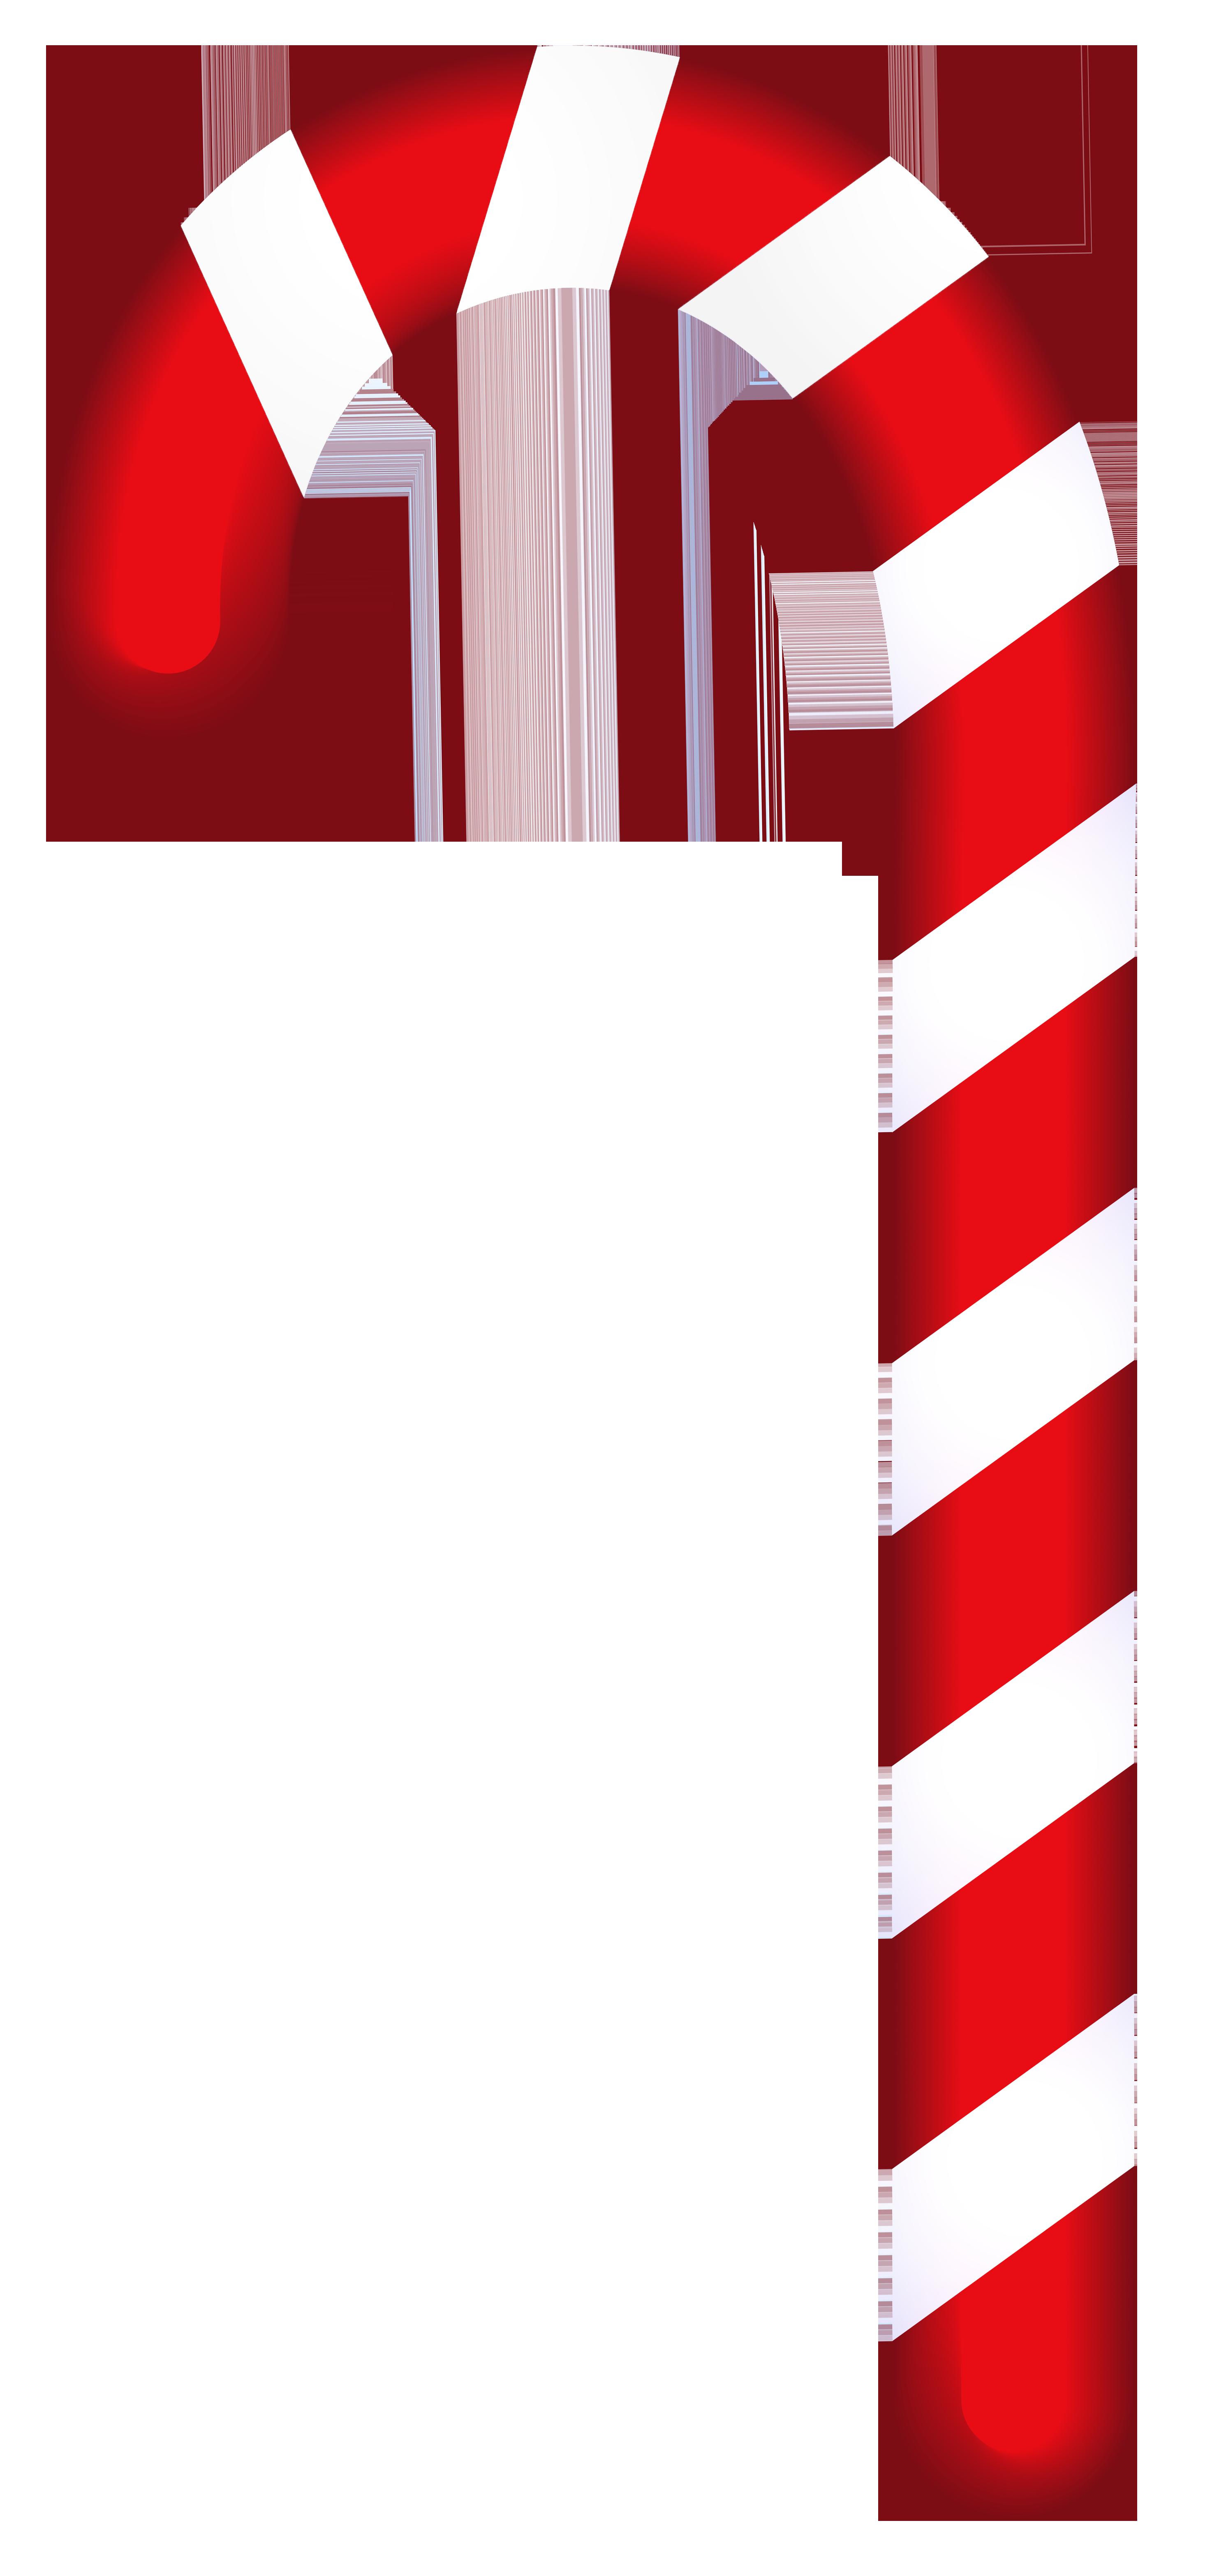 Candy cane clip art candy cane factscandy cane facts 5.